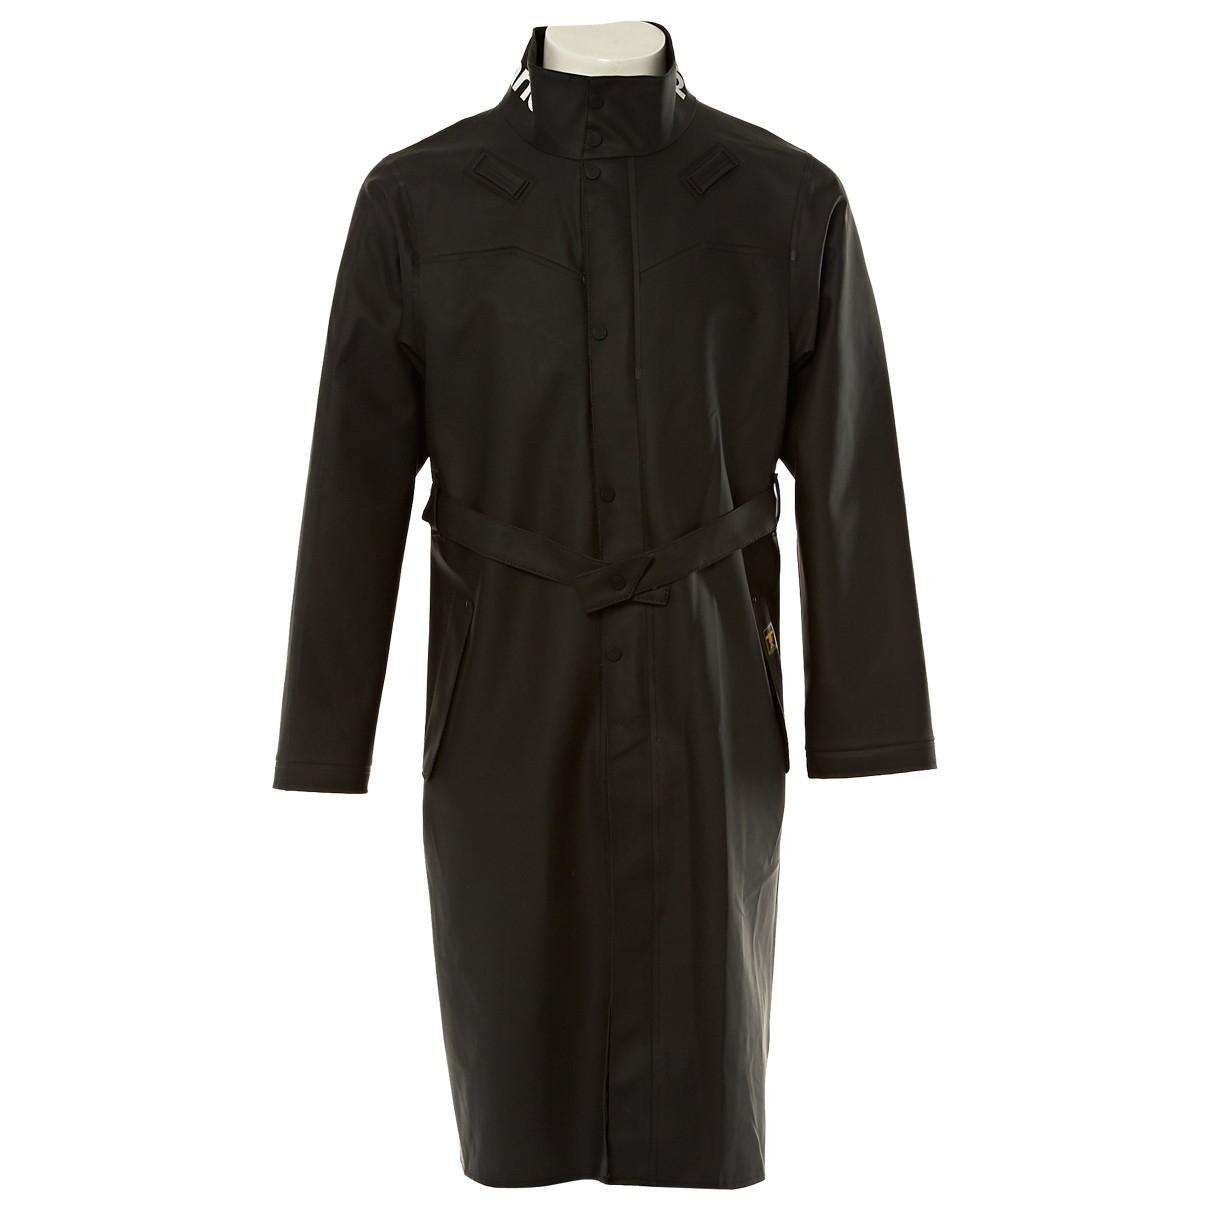 Paco Rabanne \N Black coat  for Men L International